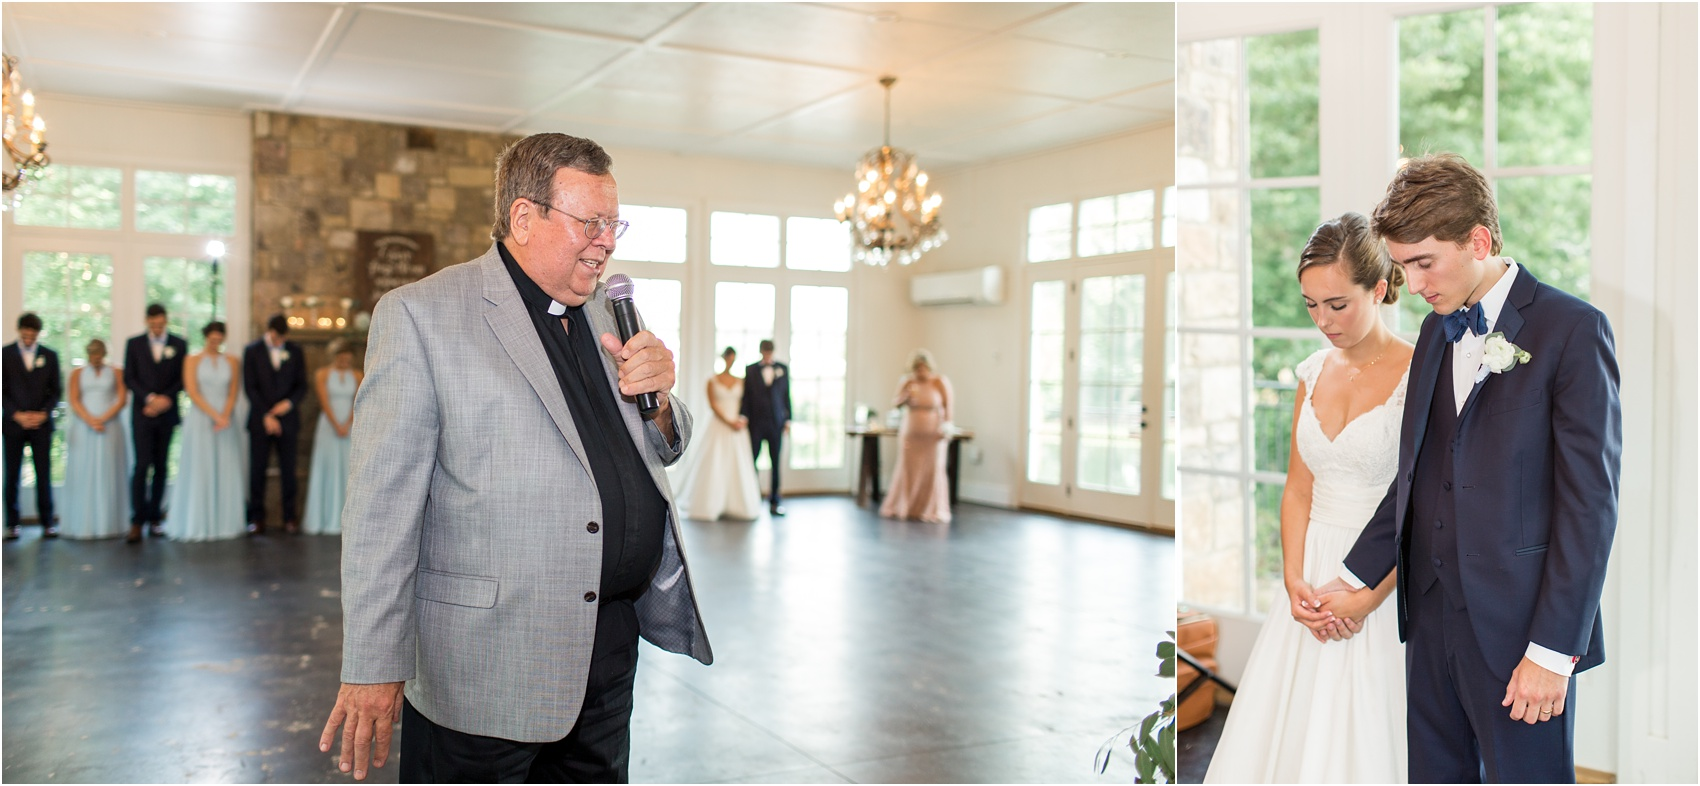 Savannah Eve Photography- Sigl-Adams Wedding- Sneak Peek-76.jpg